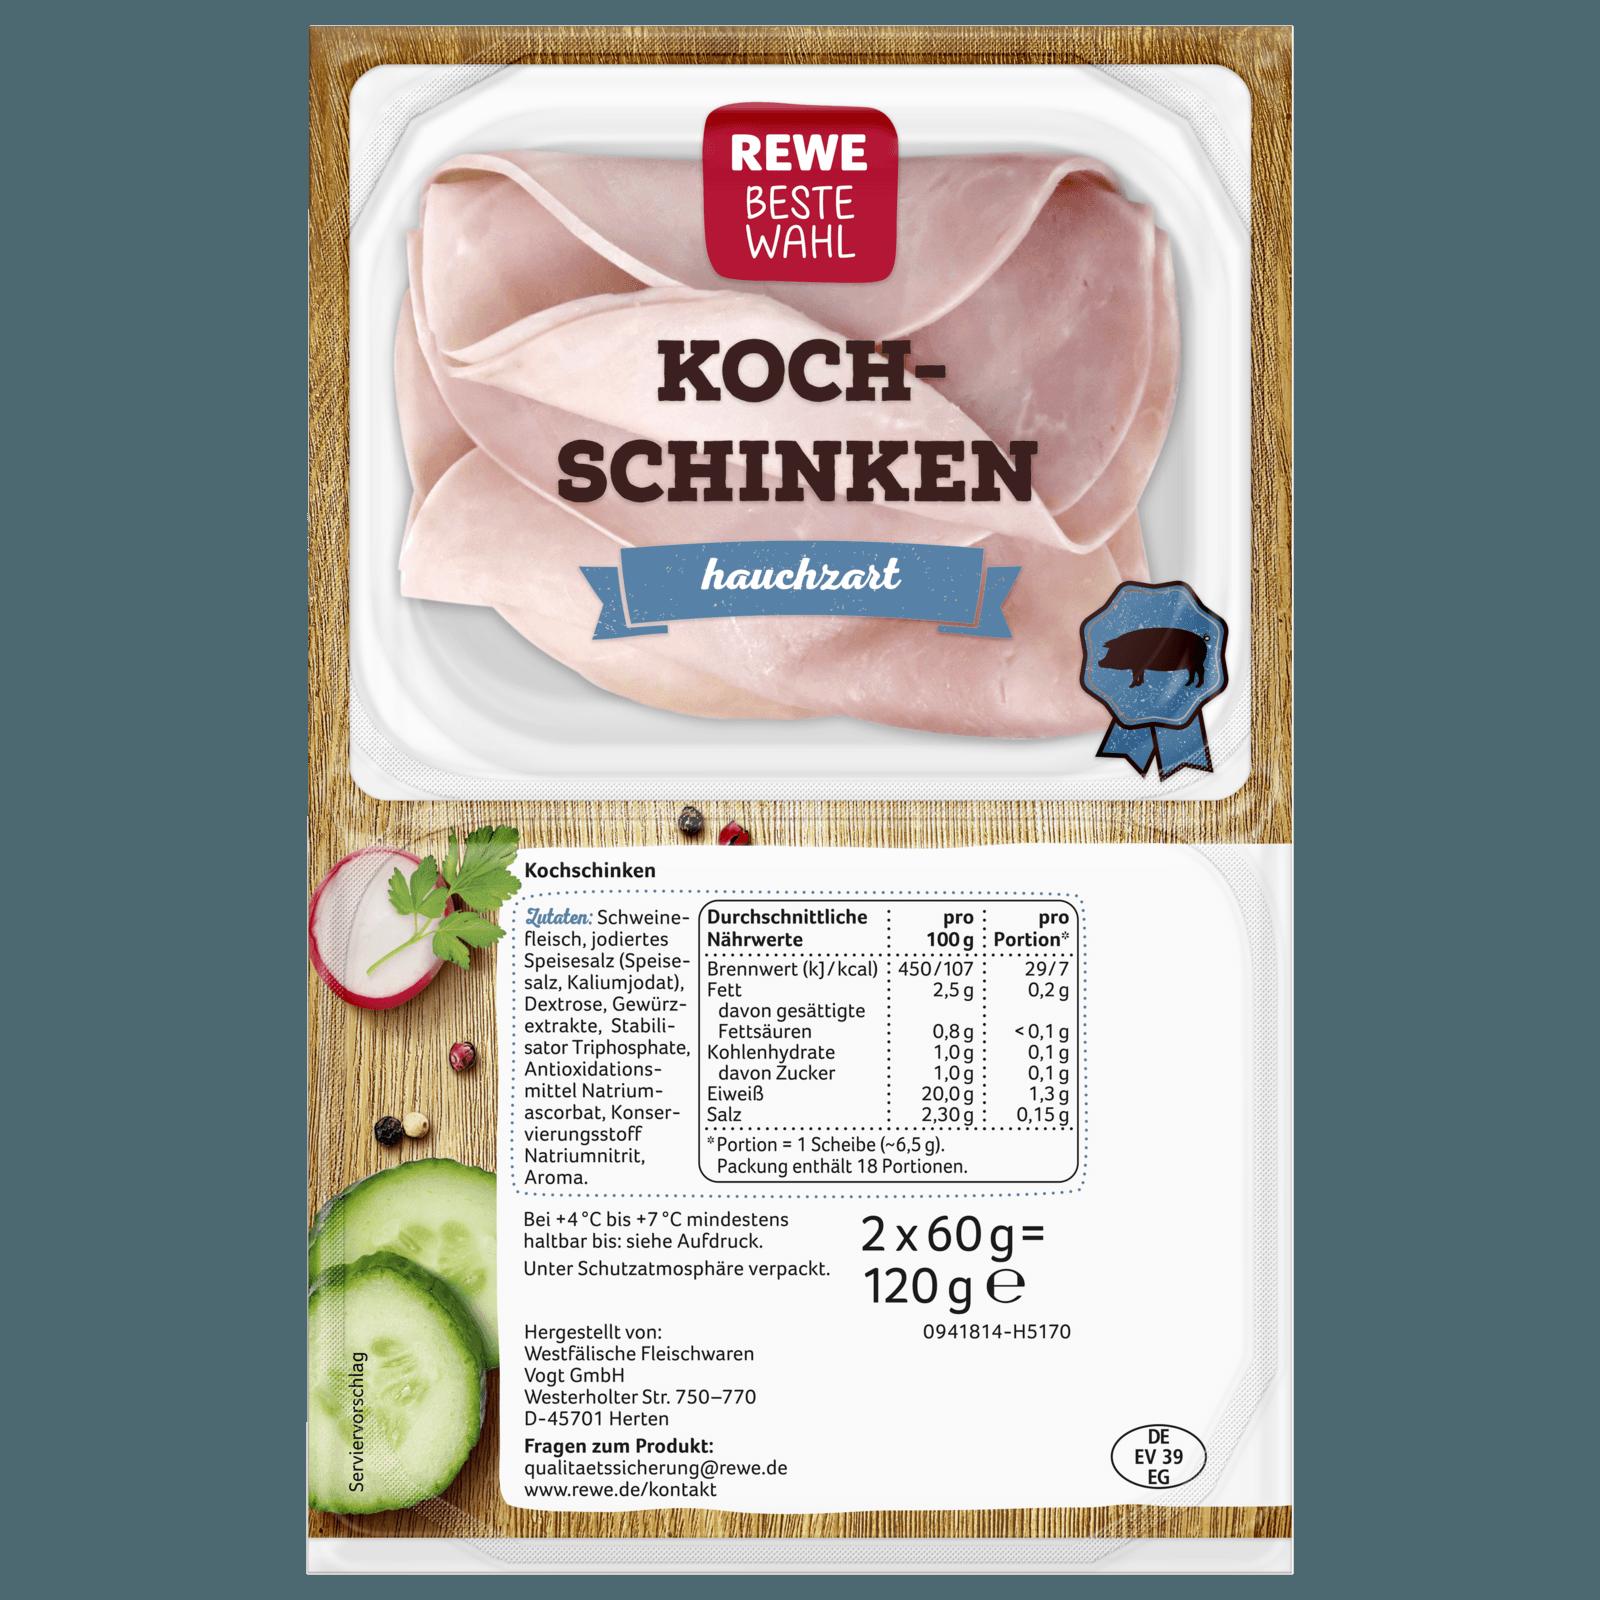 REWE Beste Wahl Kochschinken hauchzart 2x60g